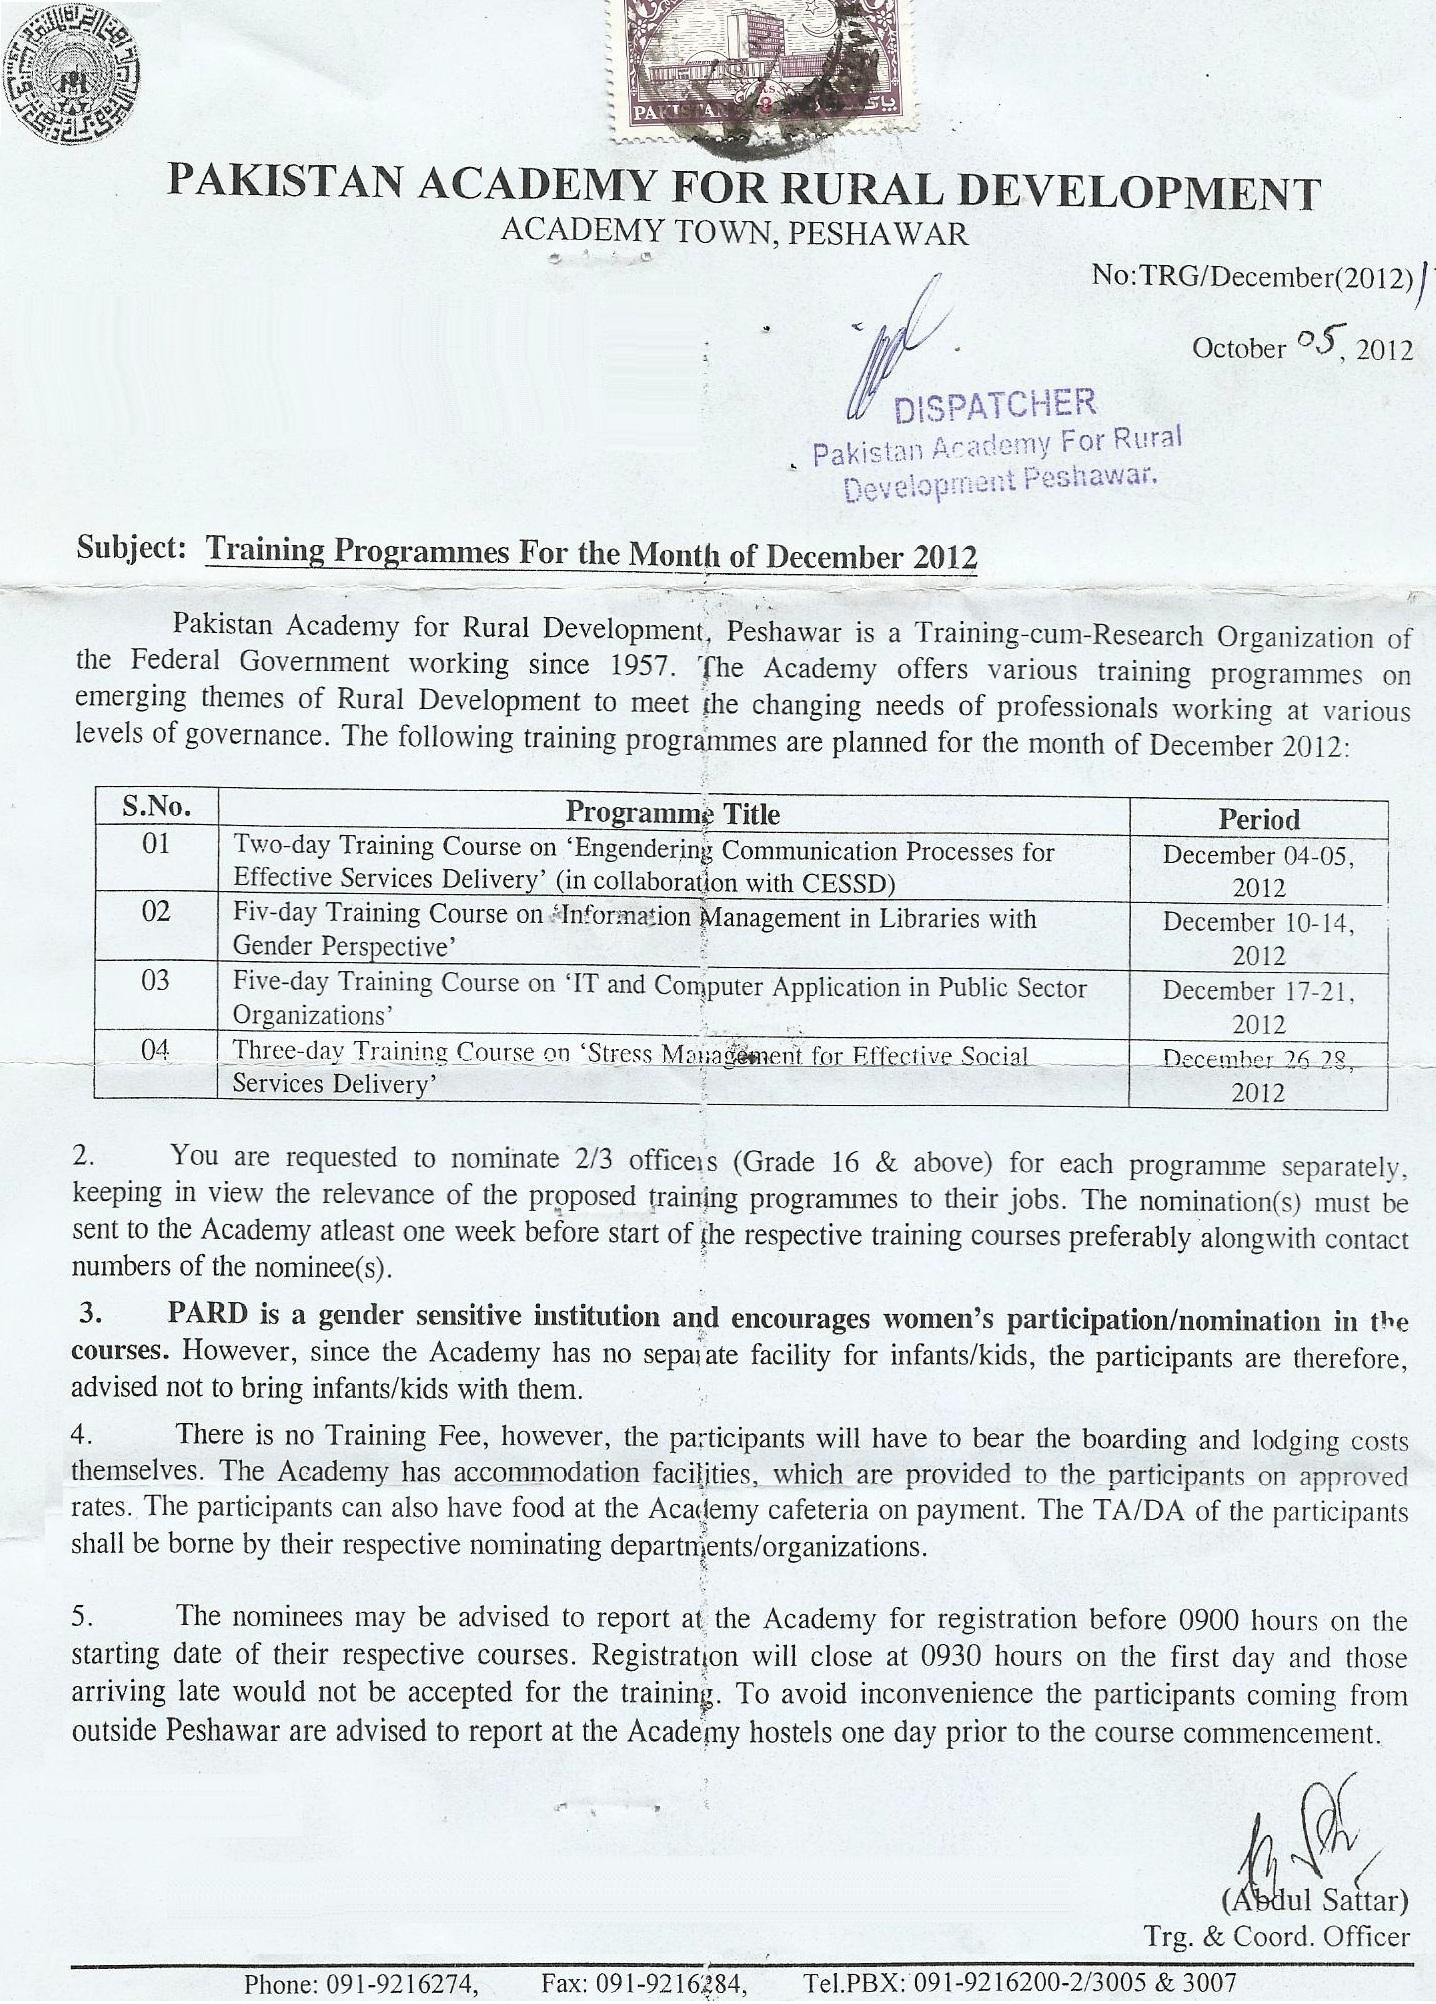 PARD December Training Calendar 2012